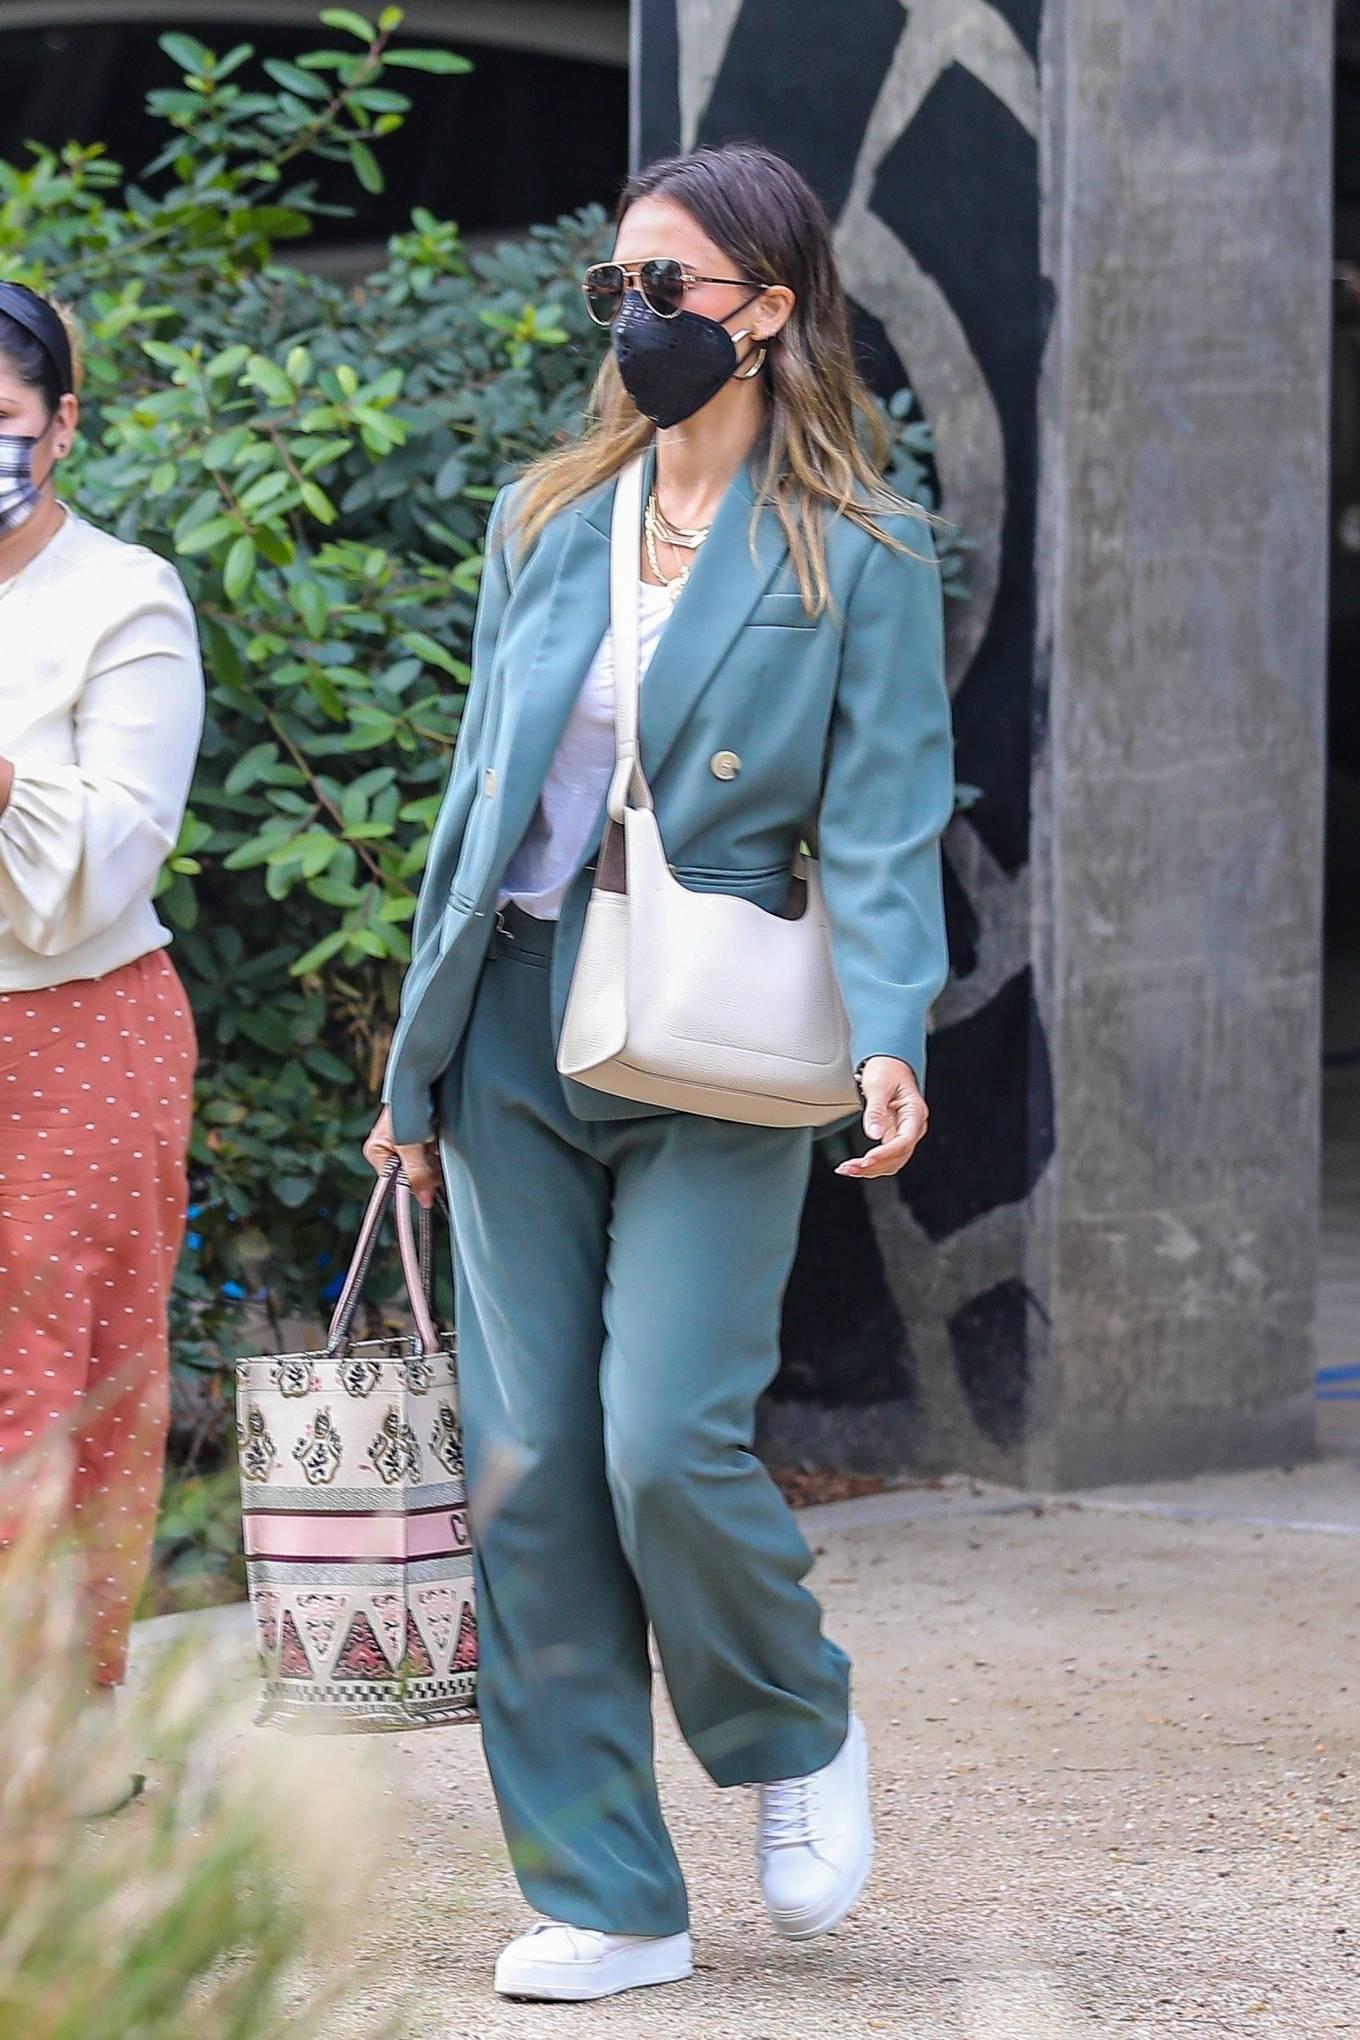 Jessica Alba 2021 : Jessica Alba – Out in a classy suit in Playa Vista-31